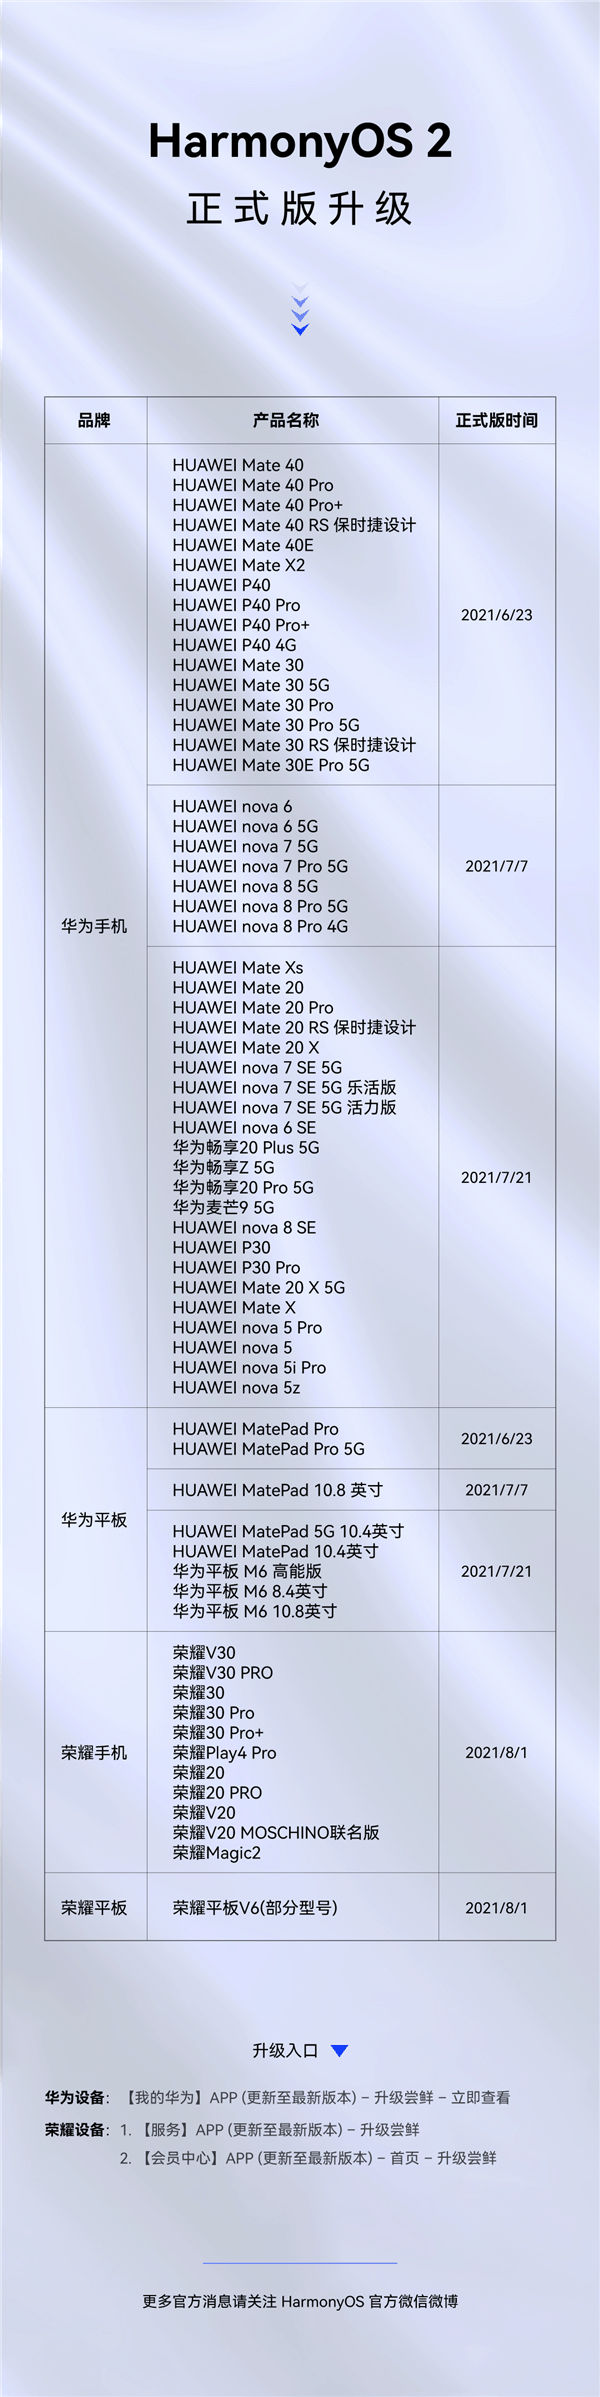 65 Smartphones Gets HarmonyOS 2 Stable Version